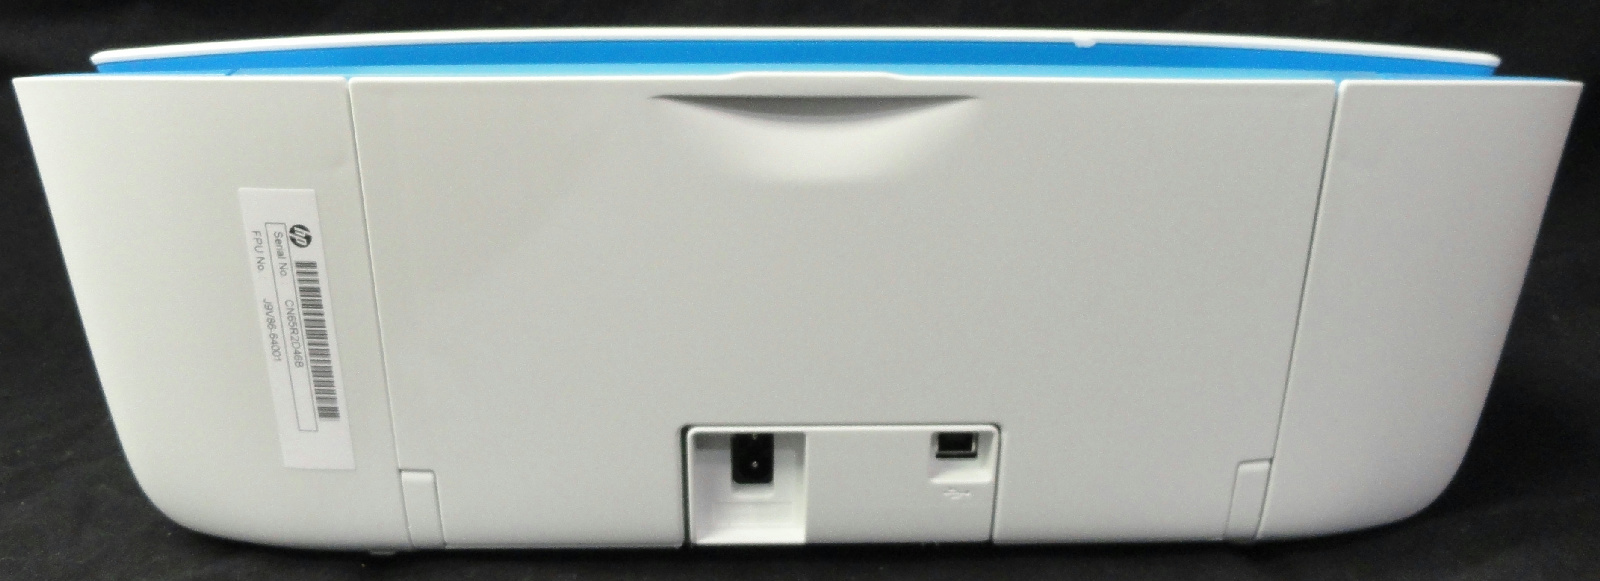 HP DeskJet 3755 All-in-One Printer   w/ Black Ink, Manual ...